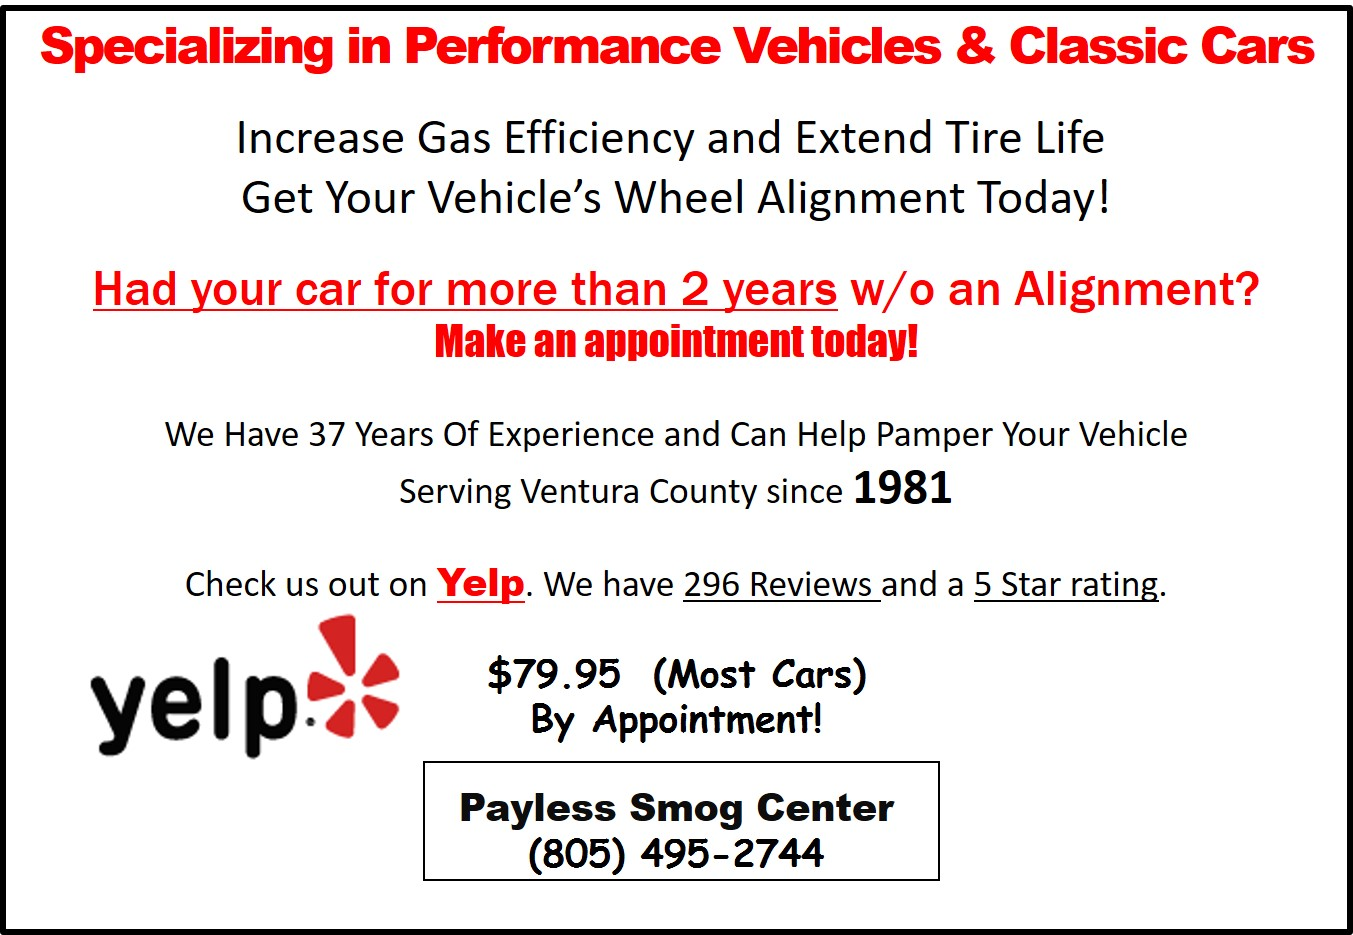 Wheel Alignment- Payless Smog Center